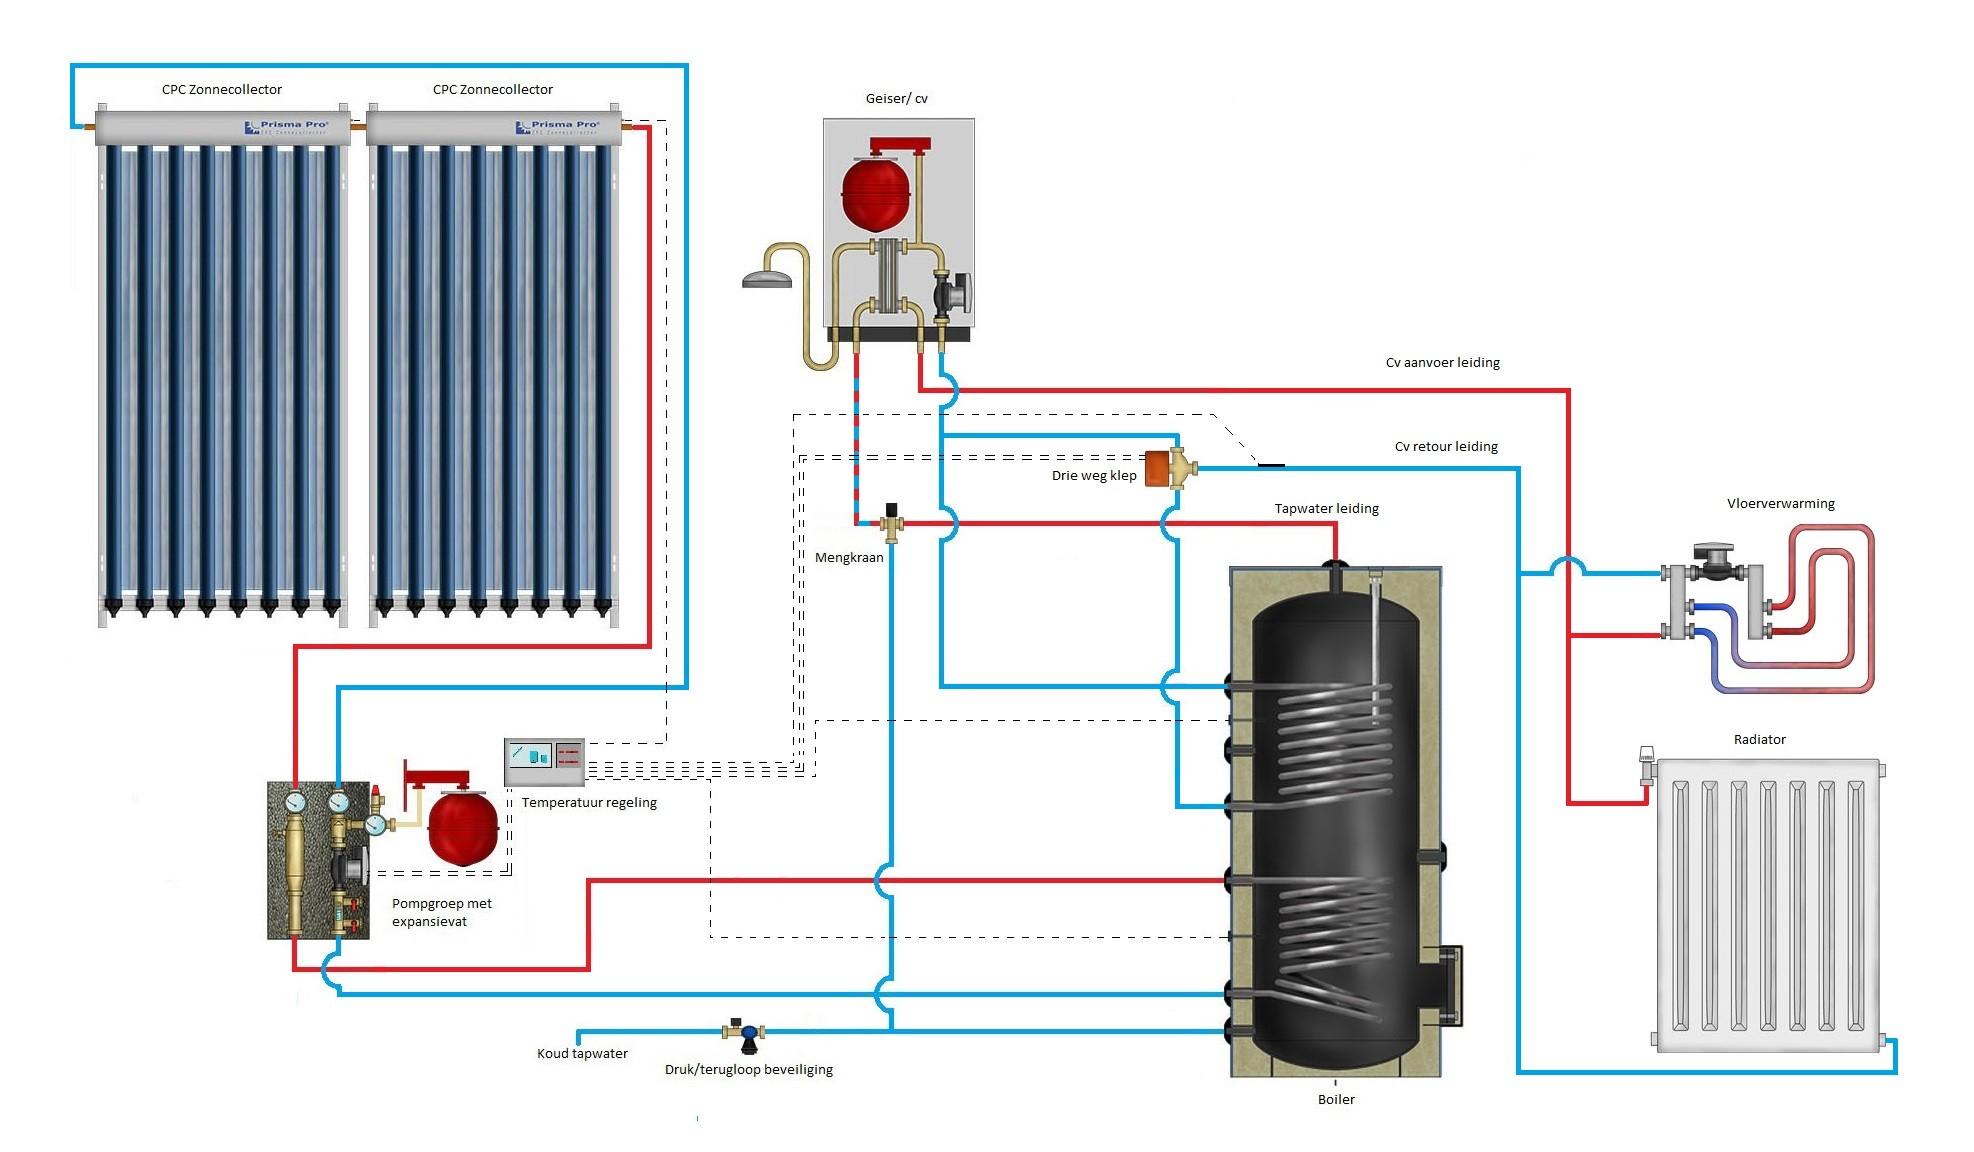 cv verwarming en tapwater zonneboiler 400l  3 x prisma pro